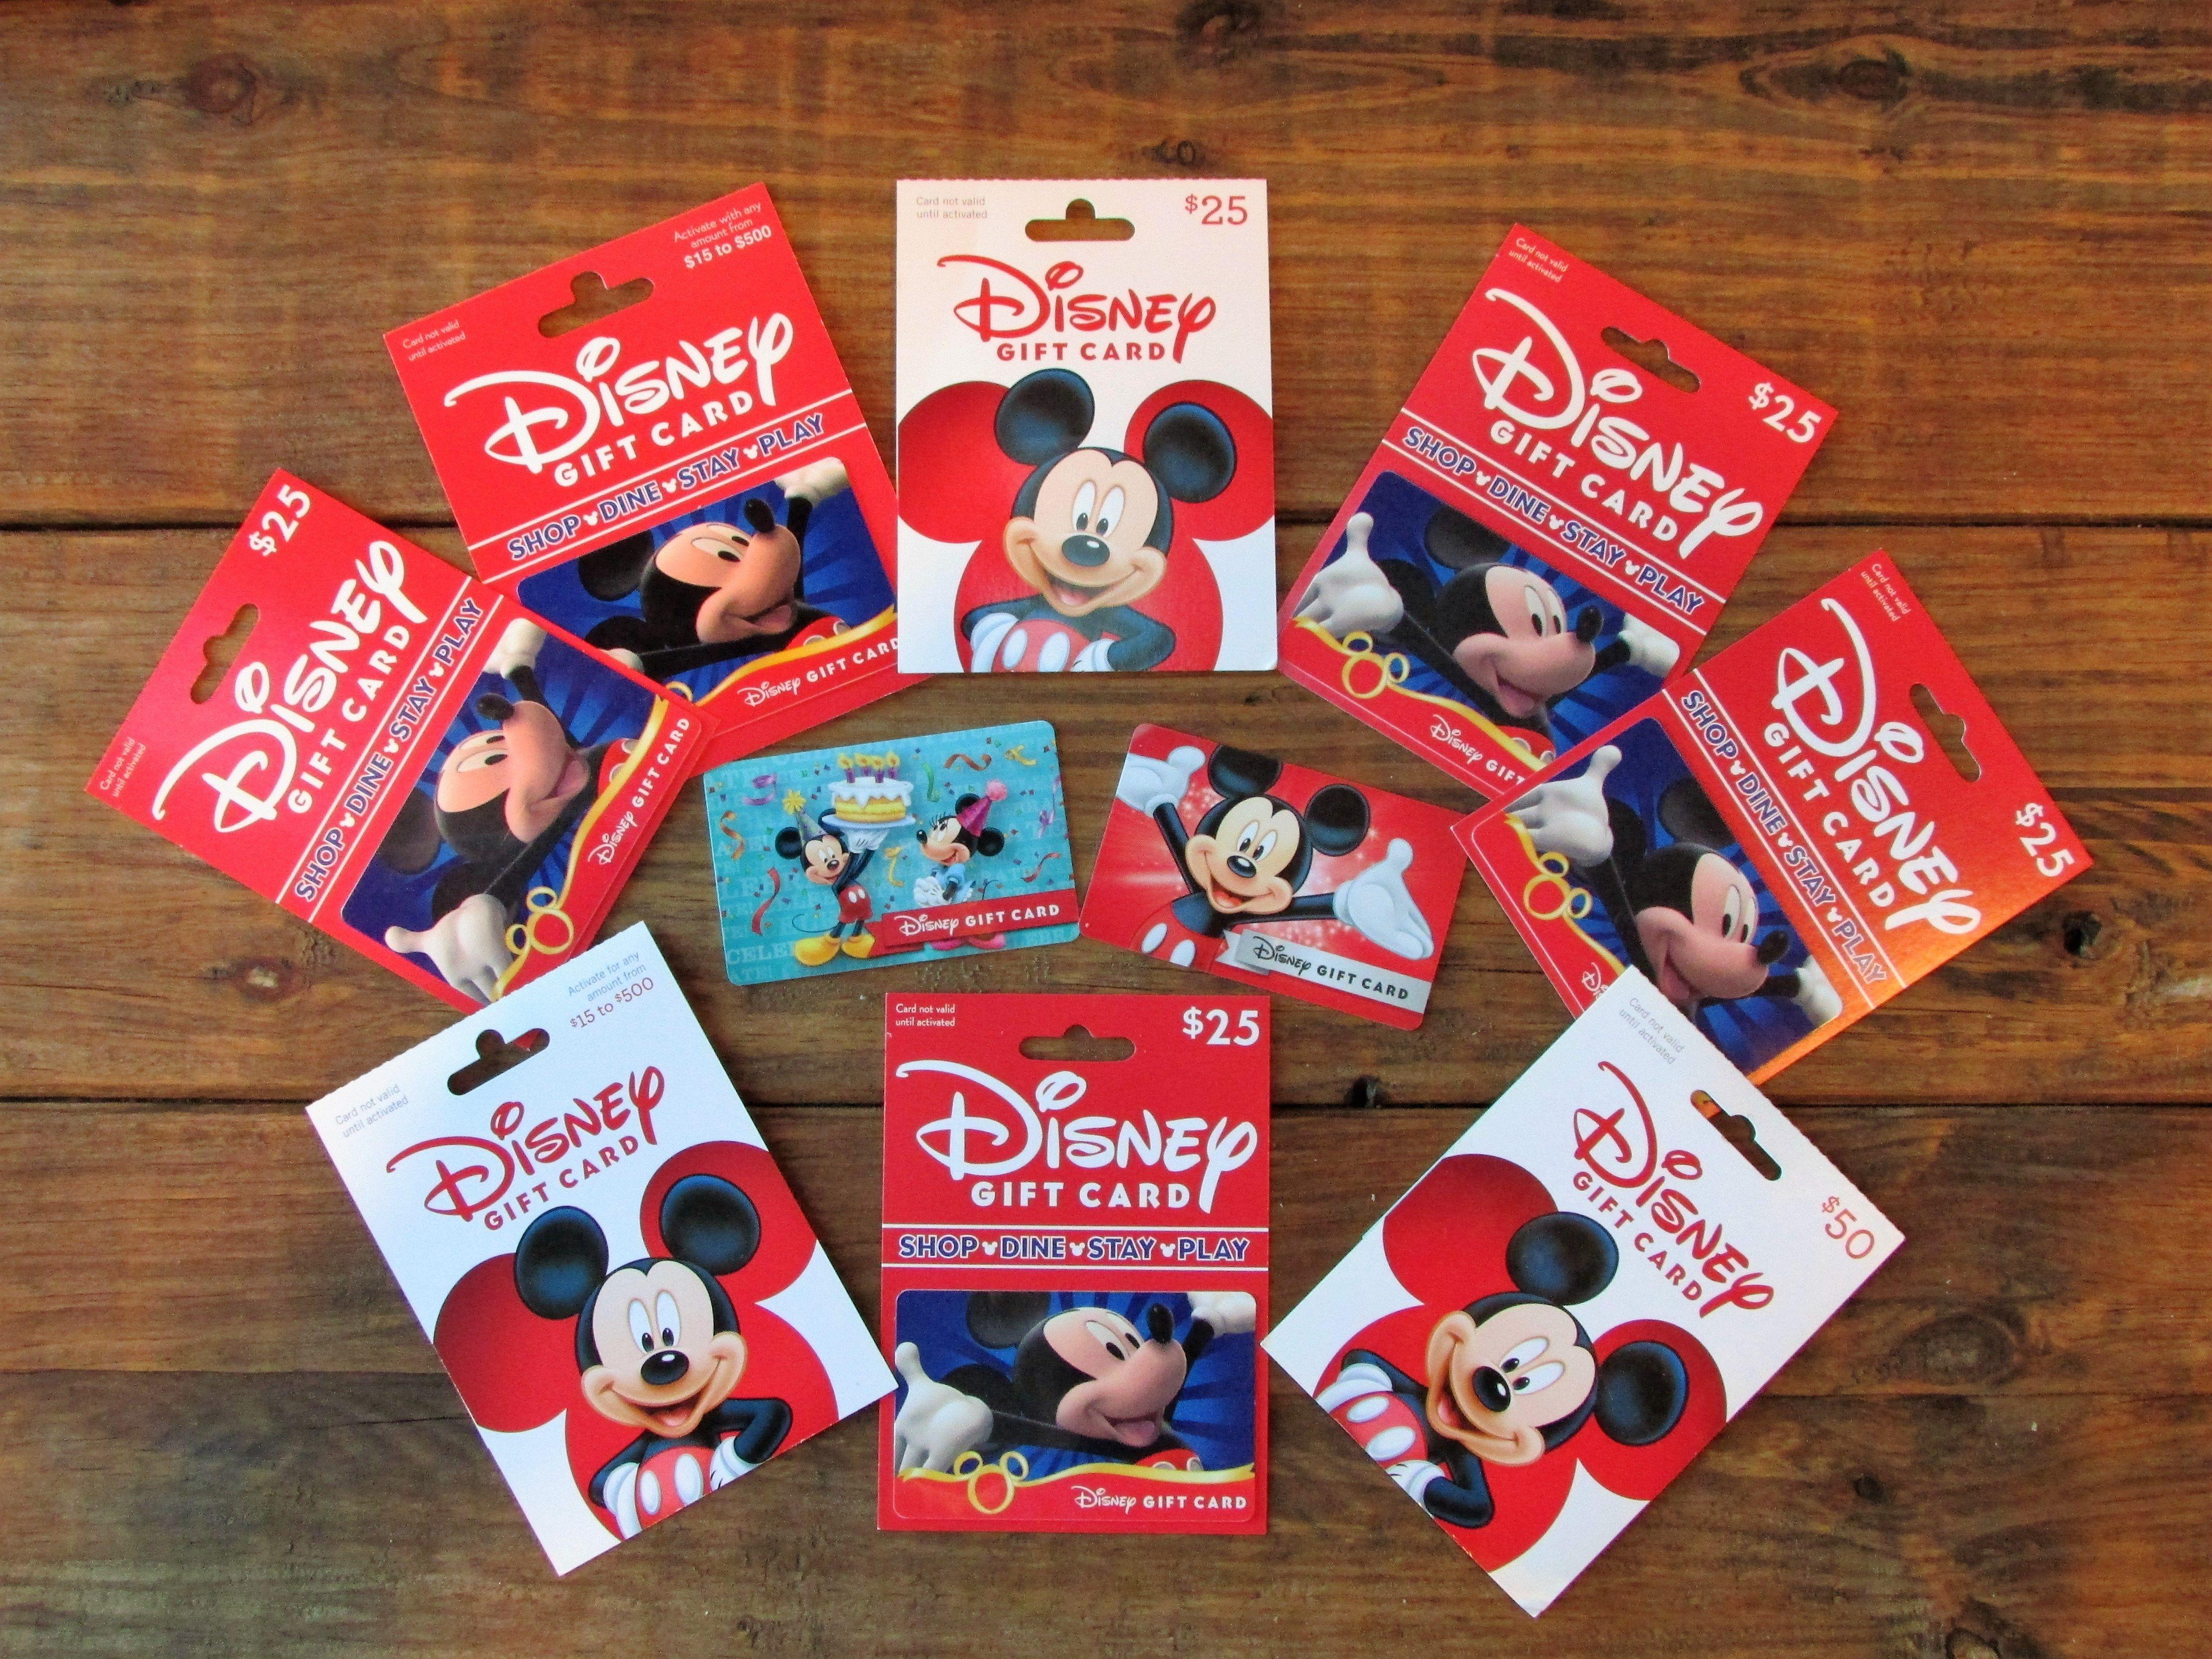 Save 11% on Disney Gift Cards -- #DisneyGiftCards #DisneyWorldDiscounts #DisneylandDiscounts #DisneyOnABudget